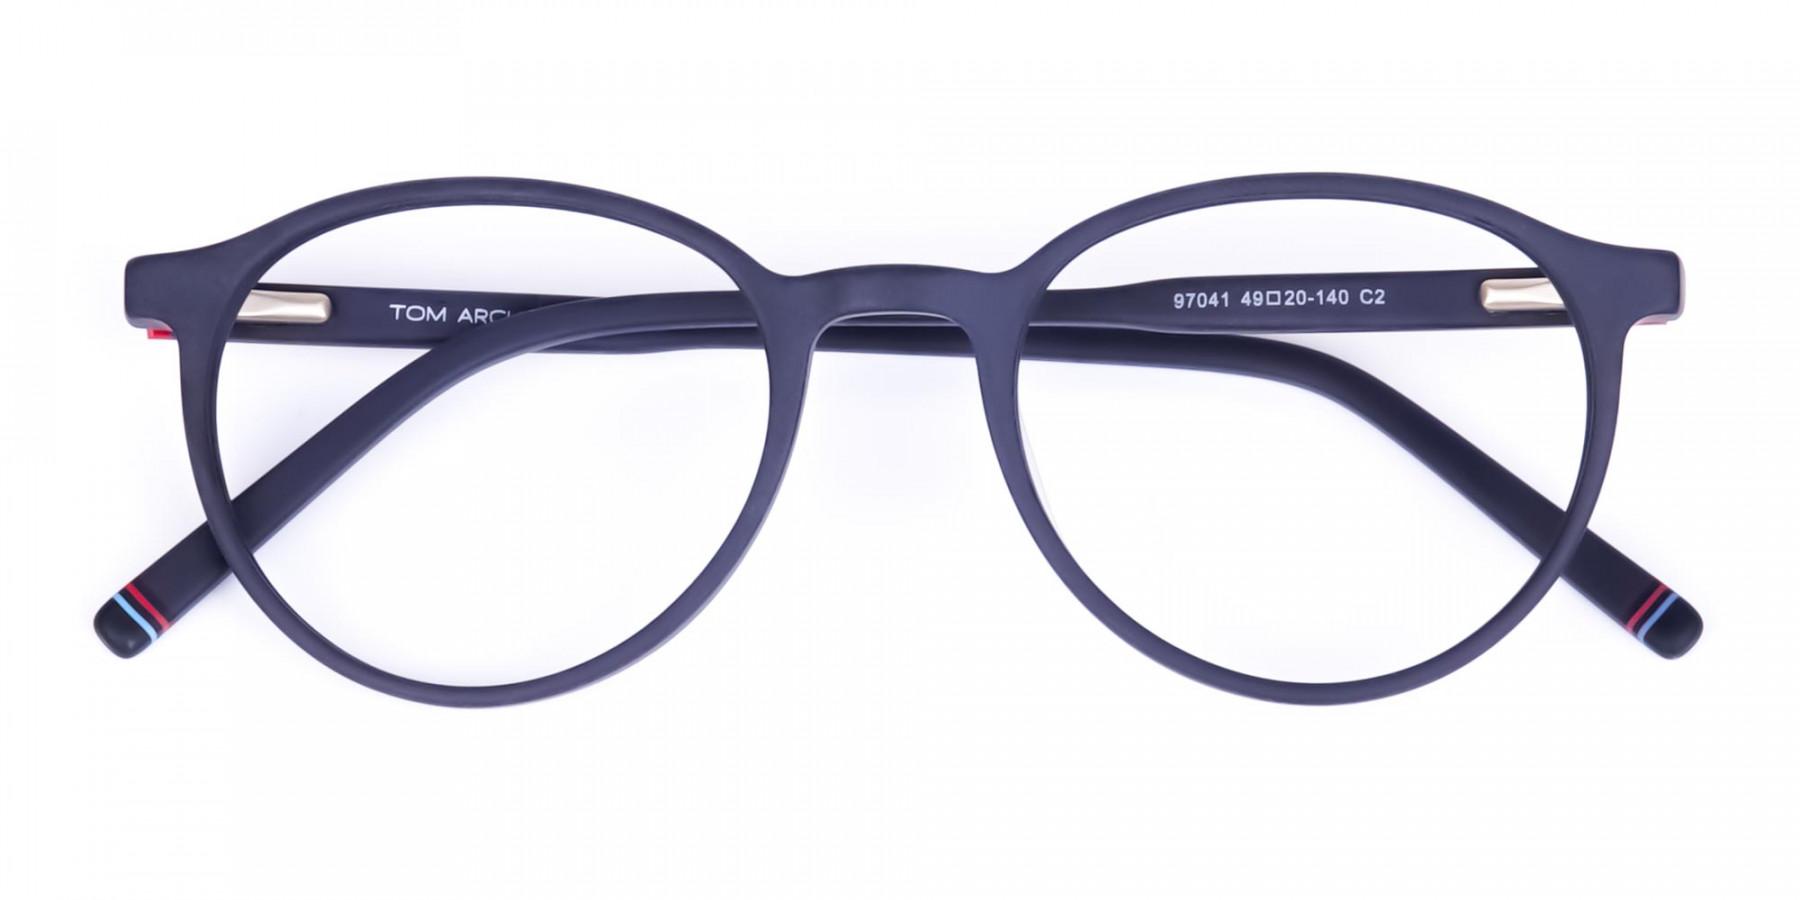 Matte-Black-Rimmed-Round-Glasses-1